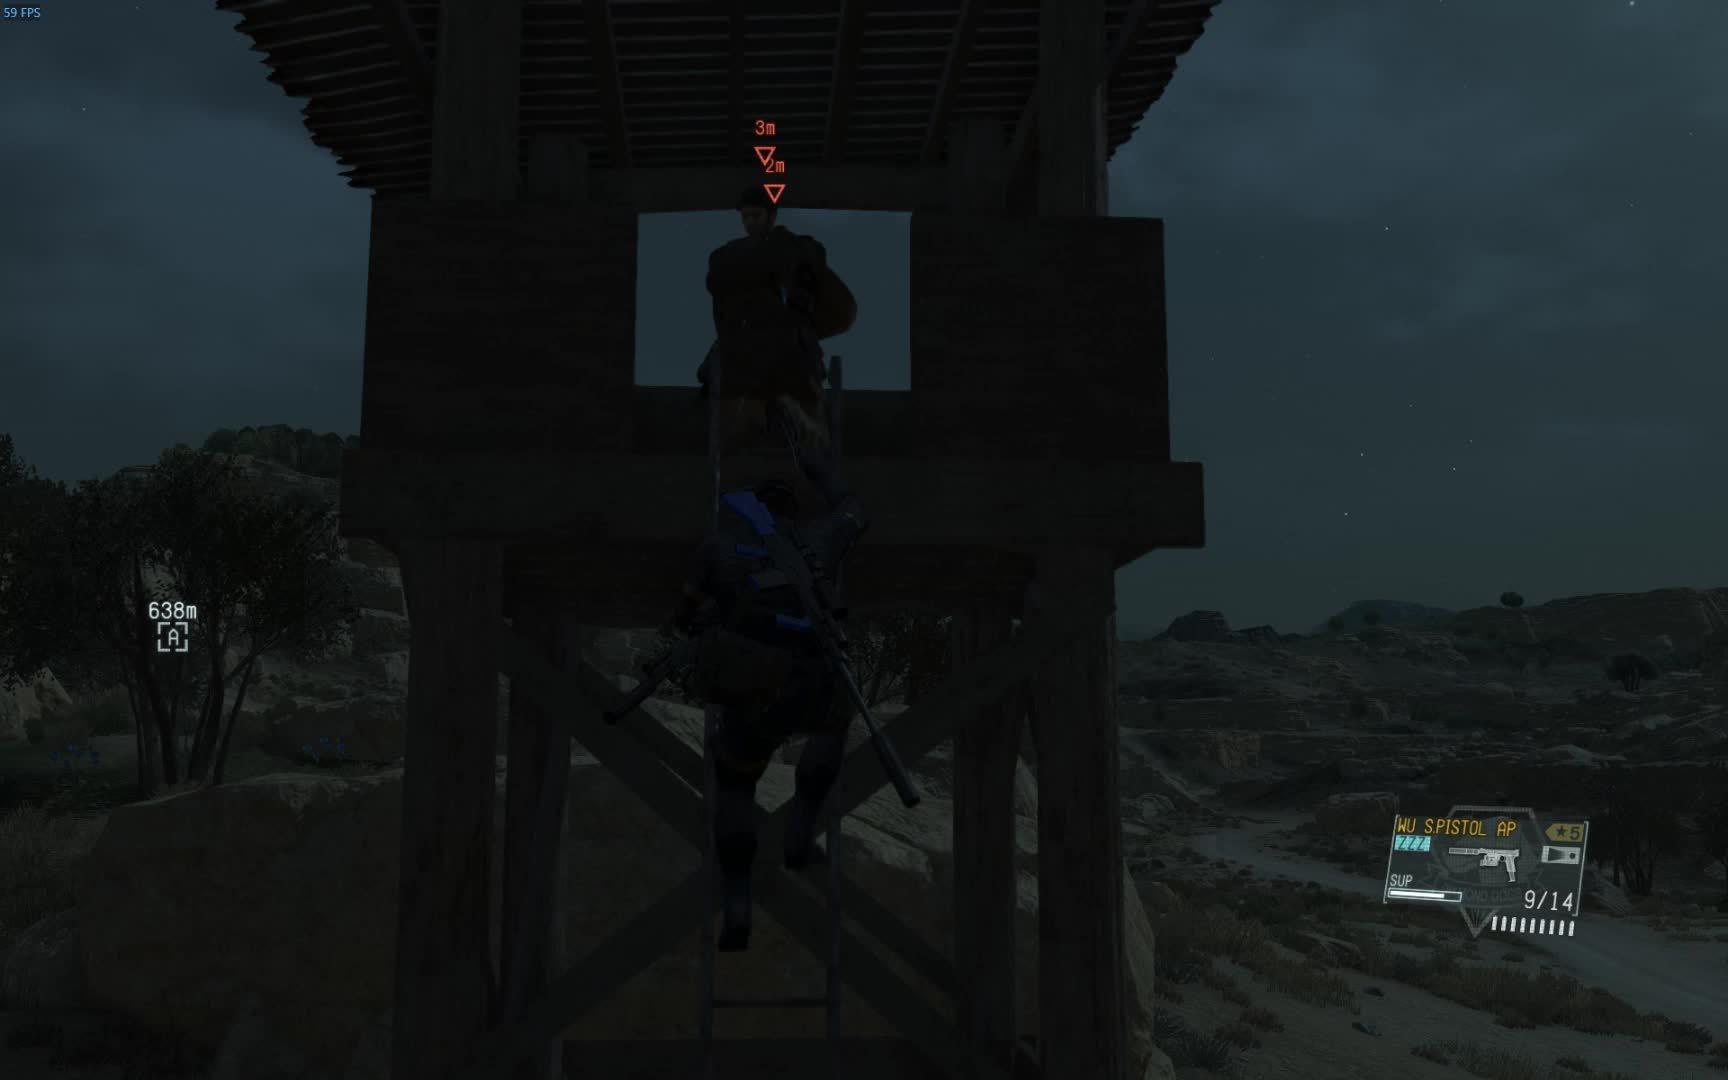 metalgearsolid, metalgearsolidv, mgsv:tpp, CQC Tactics (Metal Gear Solid V: The Phantom Pain) GIFs